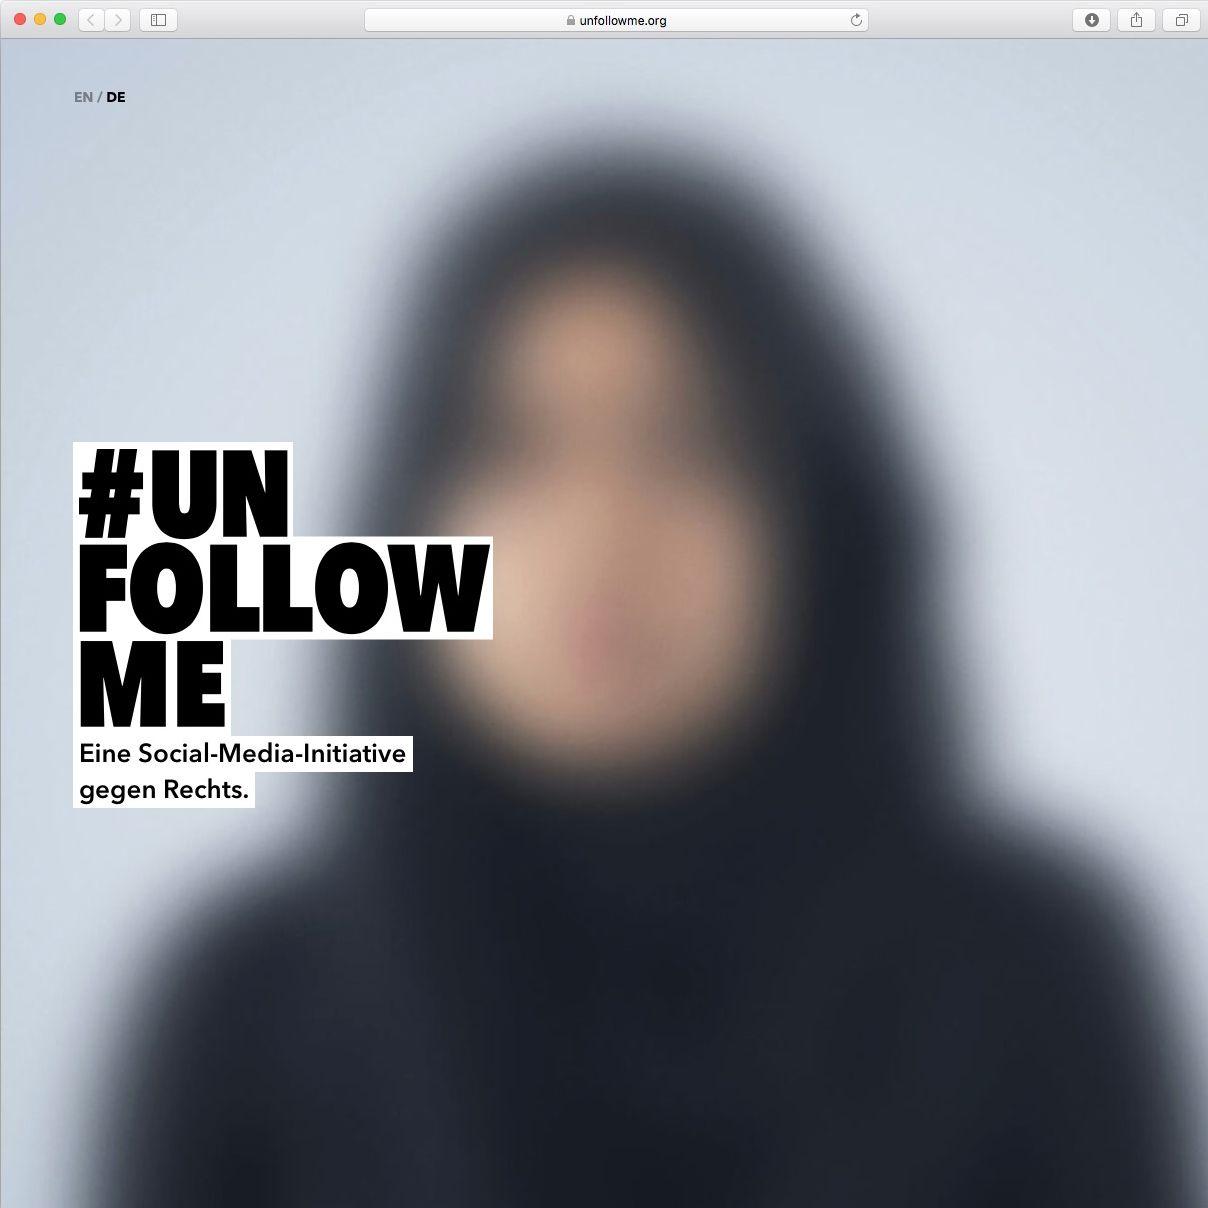 NUR ALS ZITAT Screenshot/ unfollow me/ Social-Media gegen Rechts